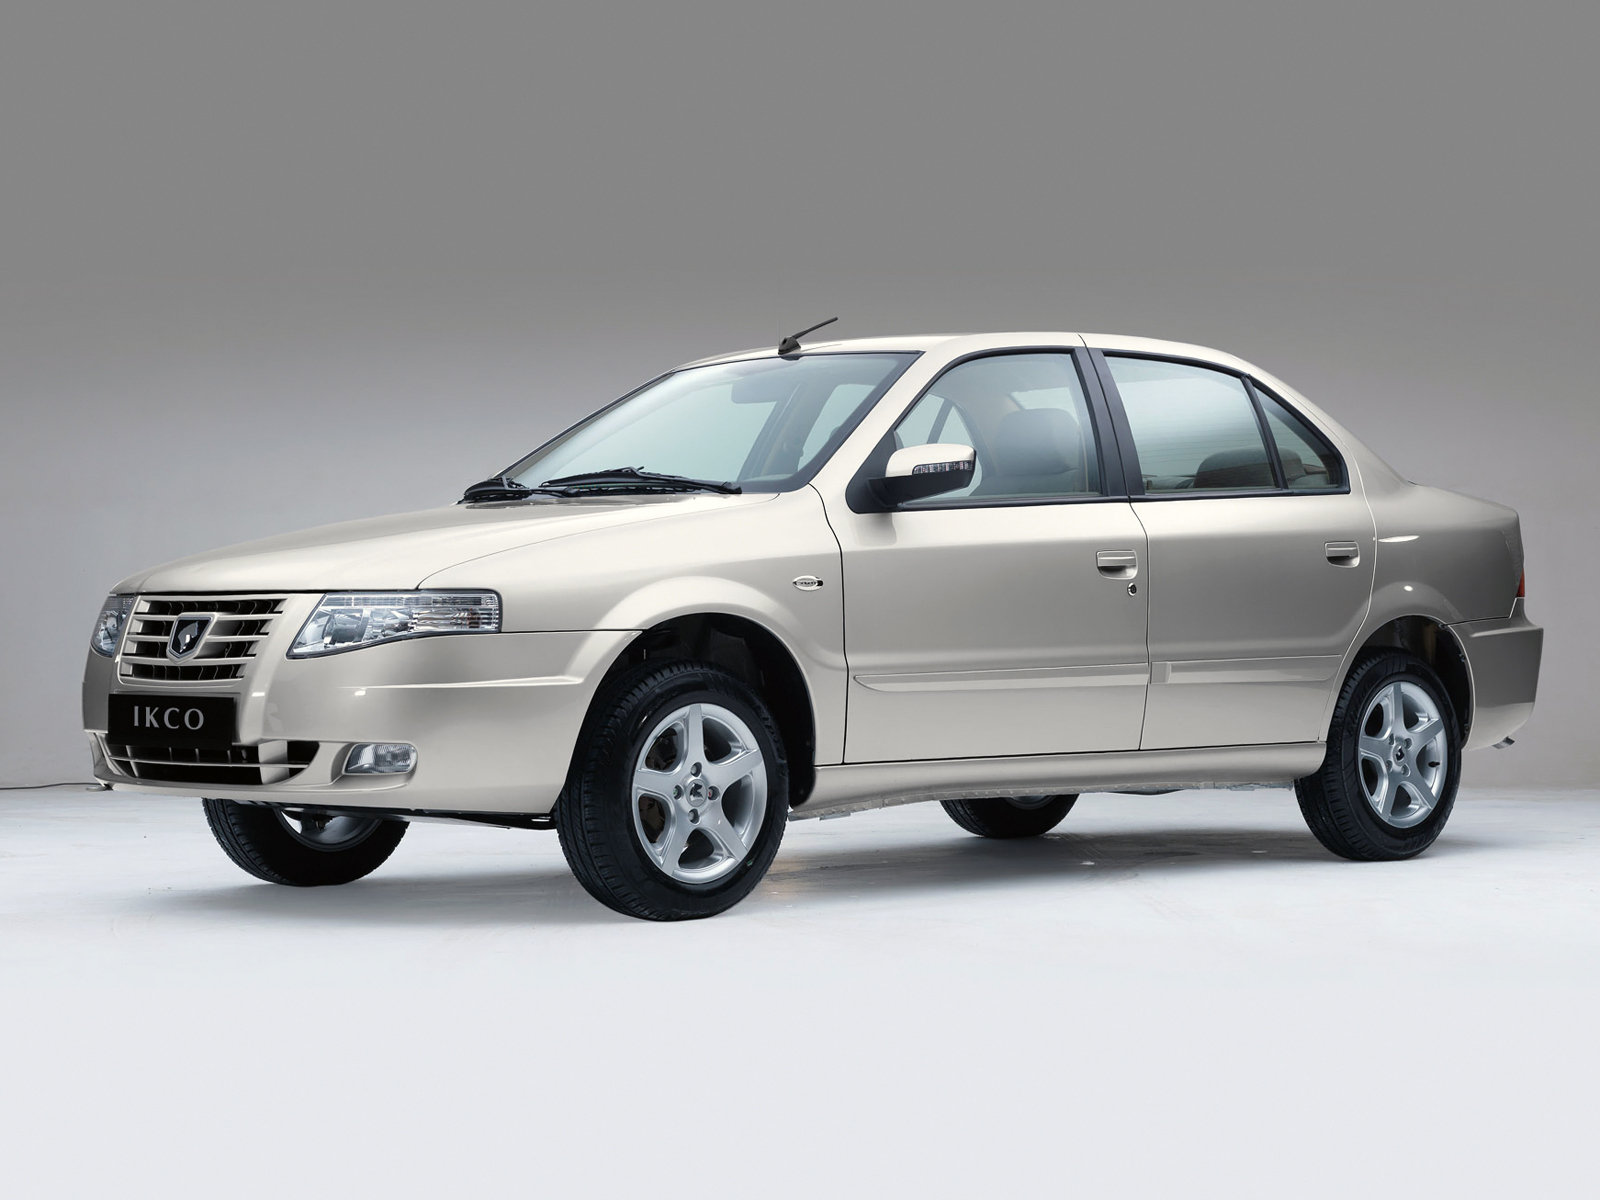 Фотографии автомобилей iran khodro soren / иран ходро сорен (2007 - 2009) седан